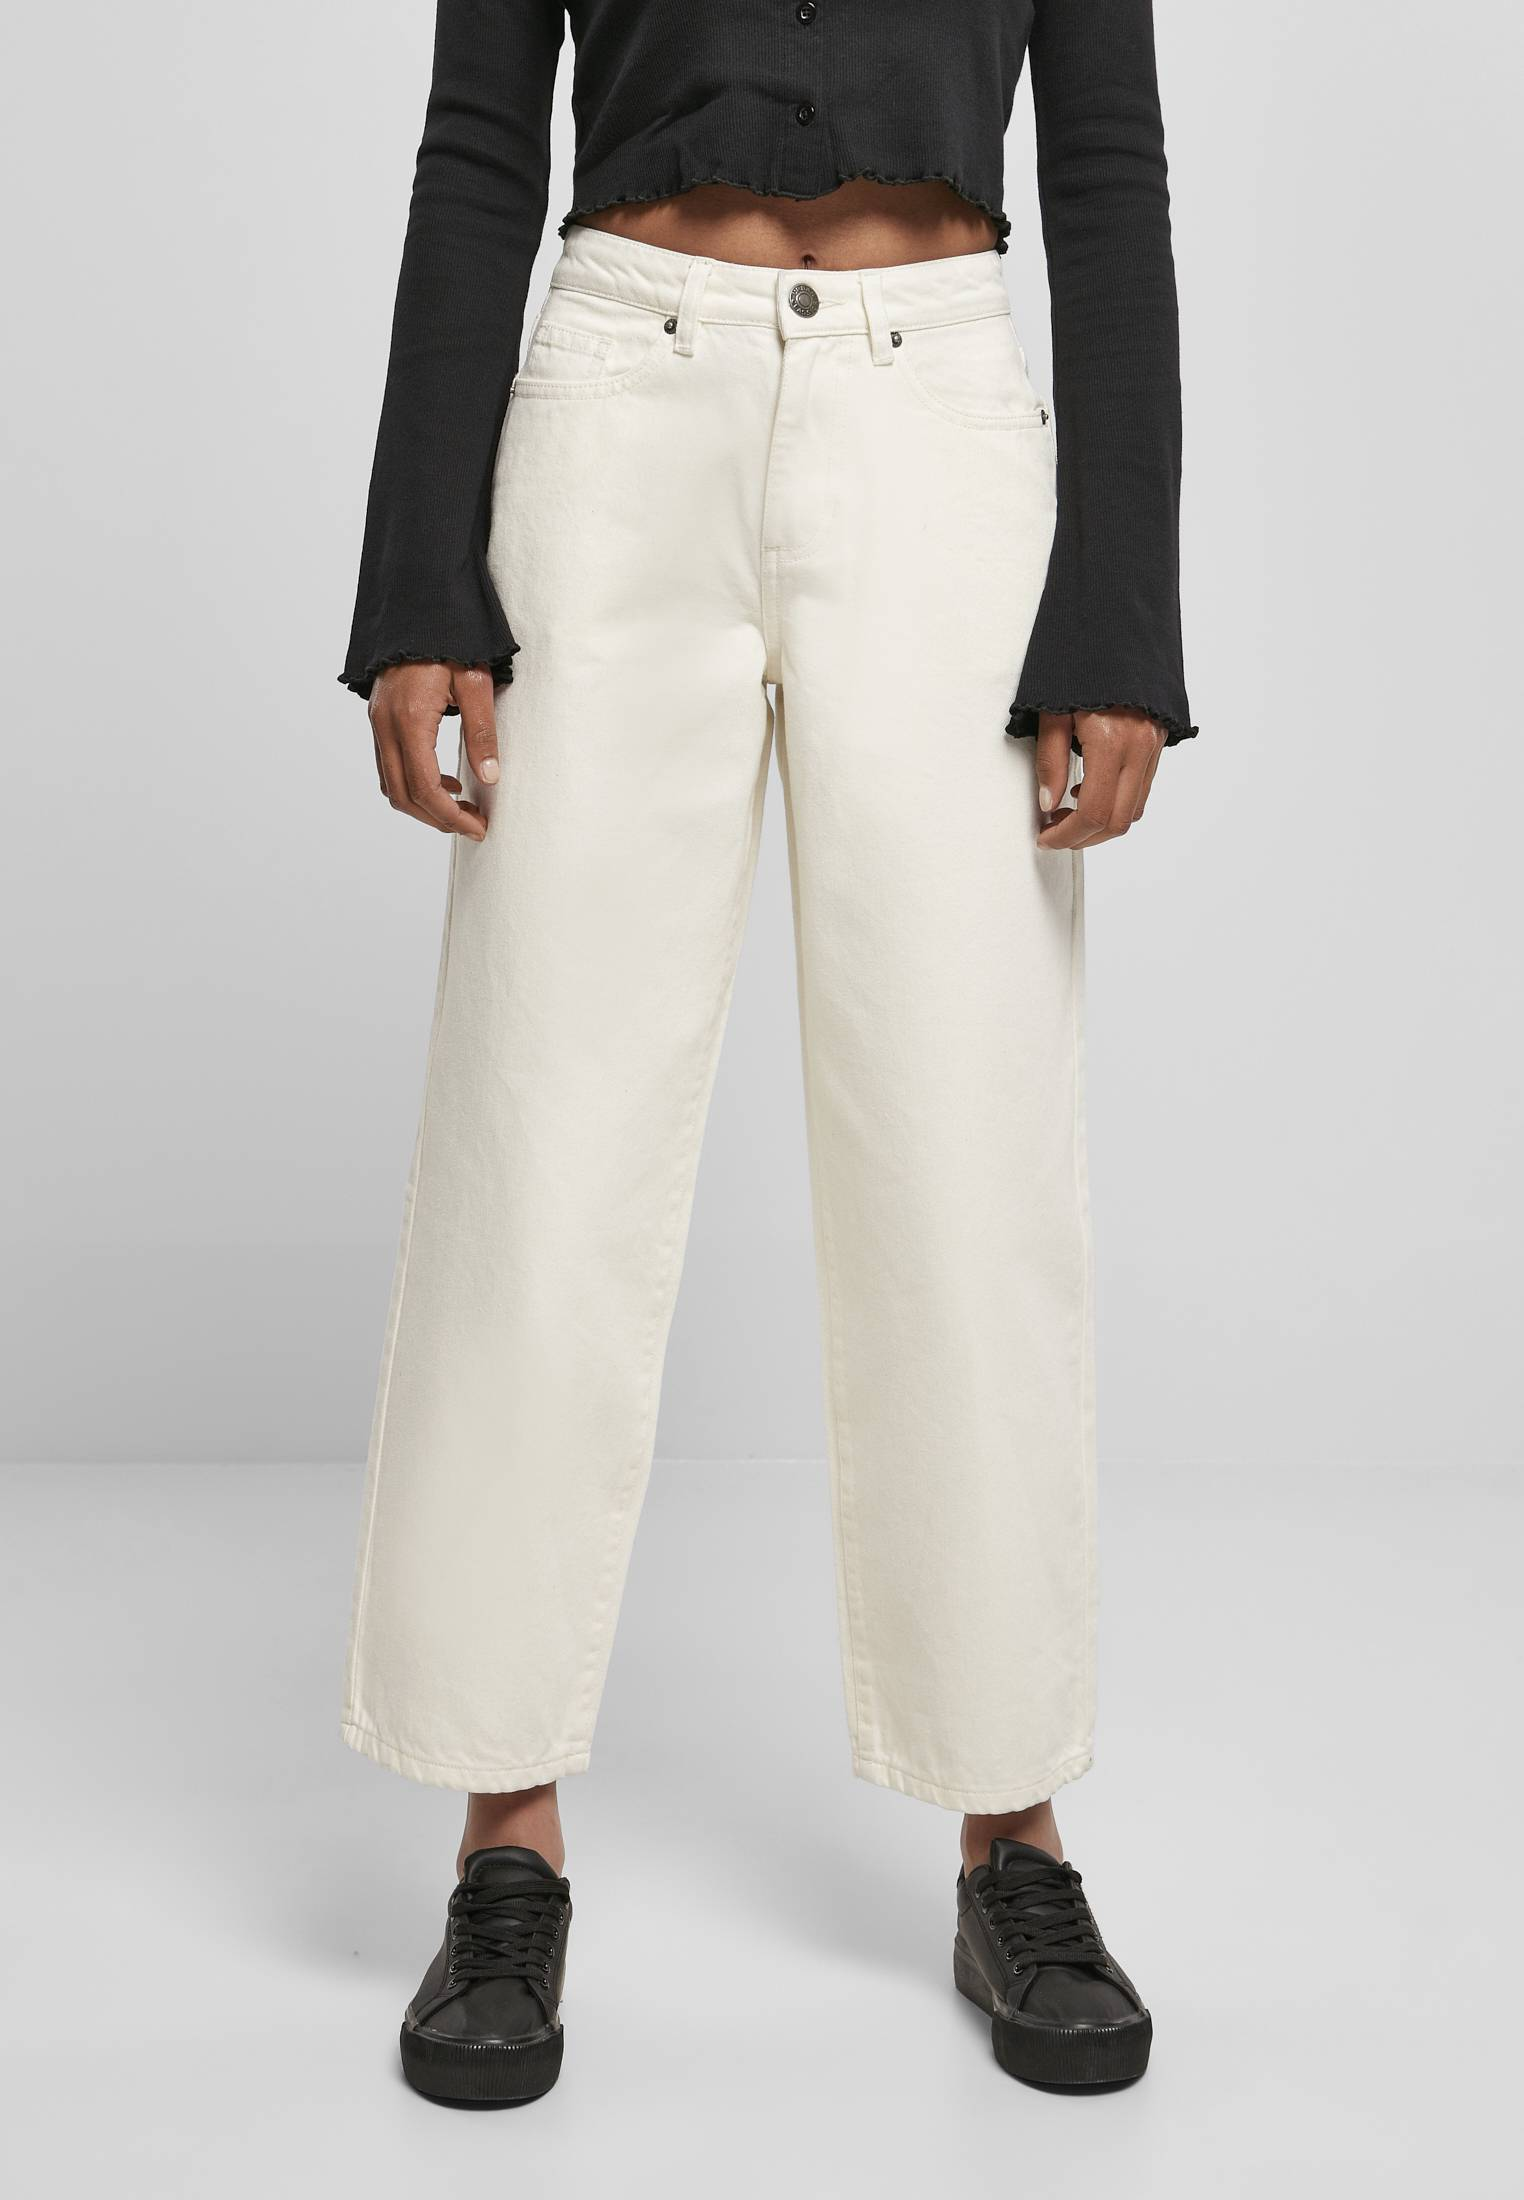 Ladies High Waist Wide Leg Cropped Denim Pants whitesand - 26